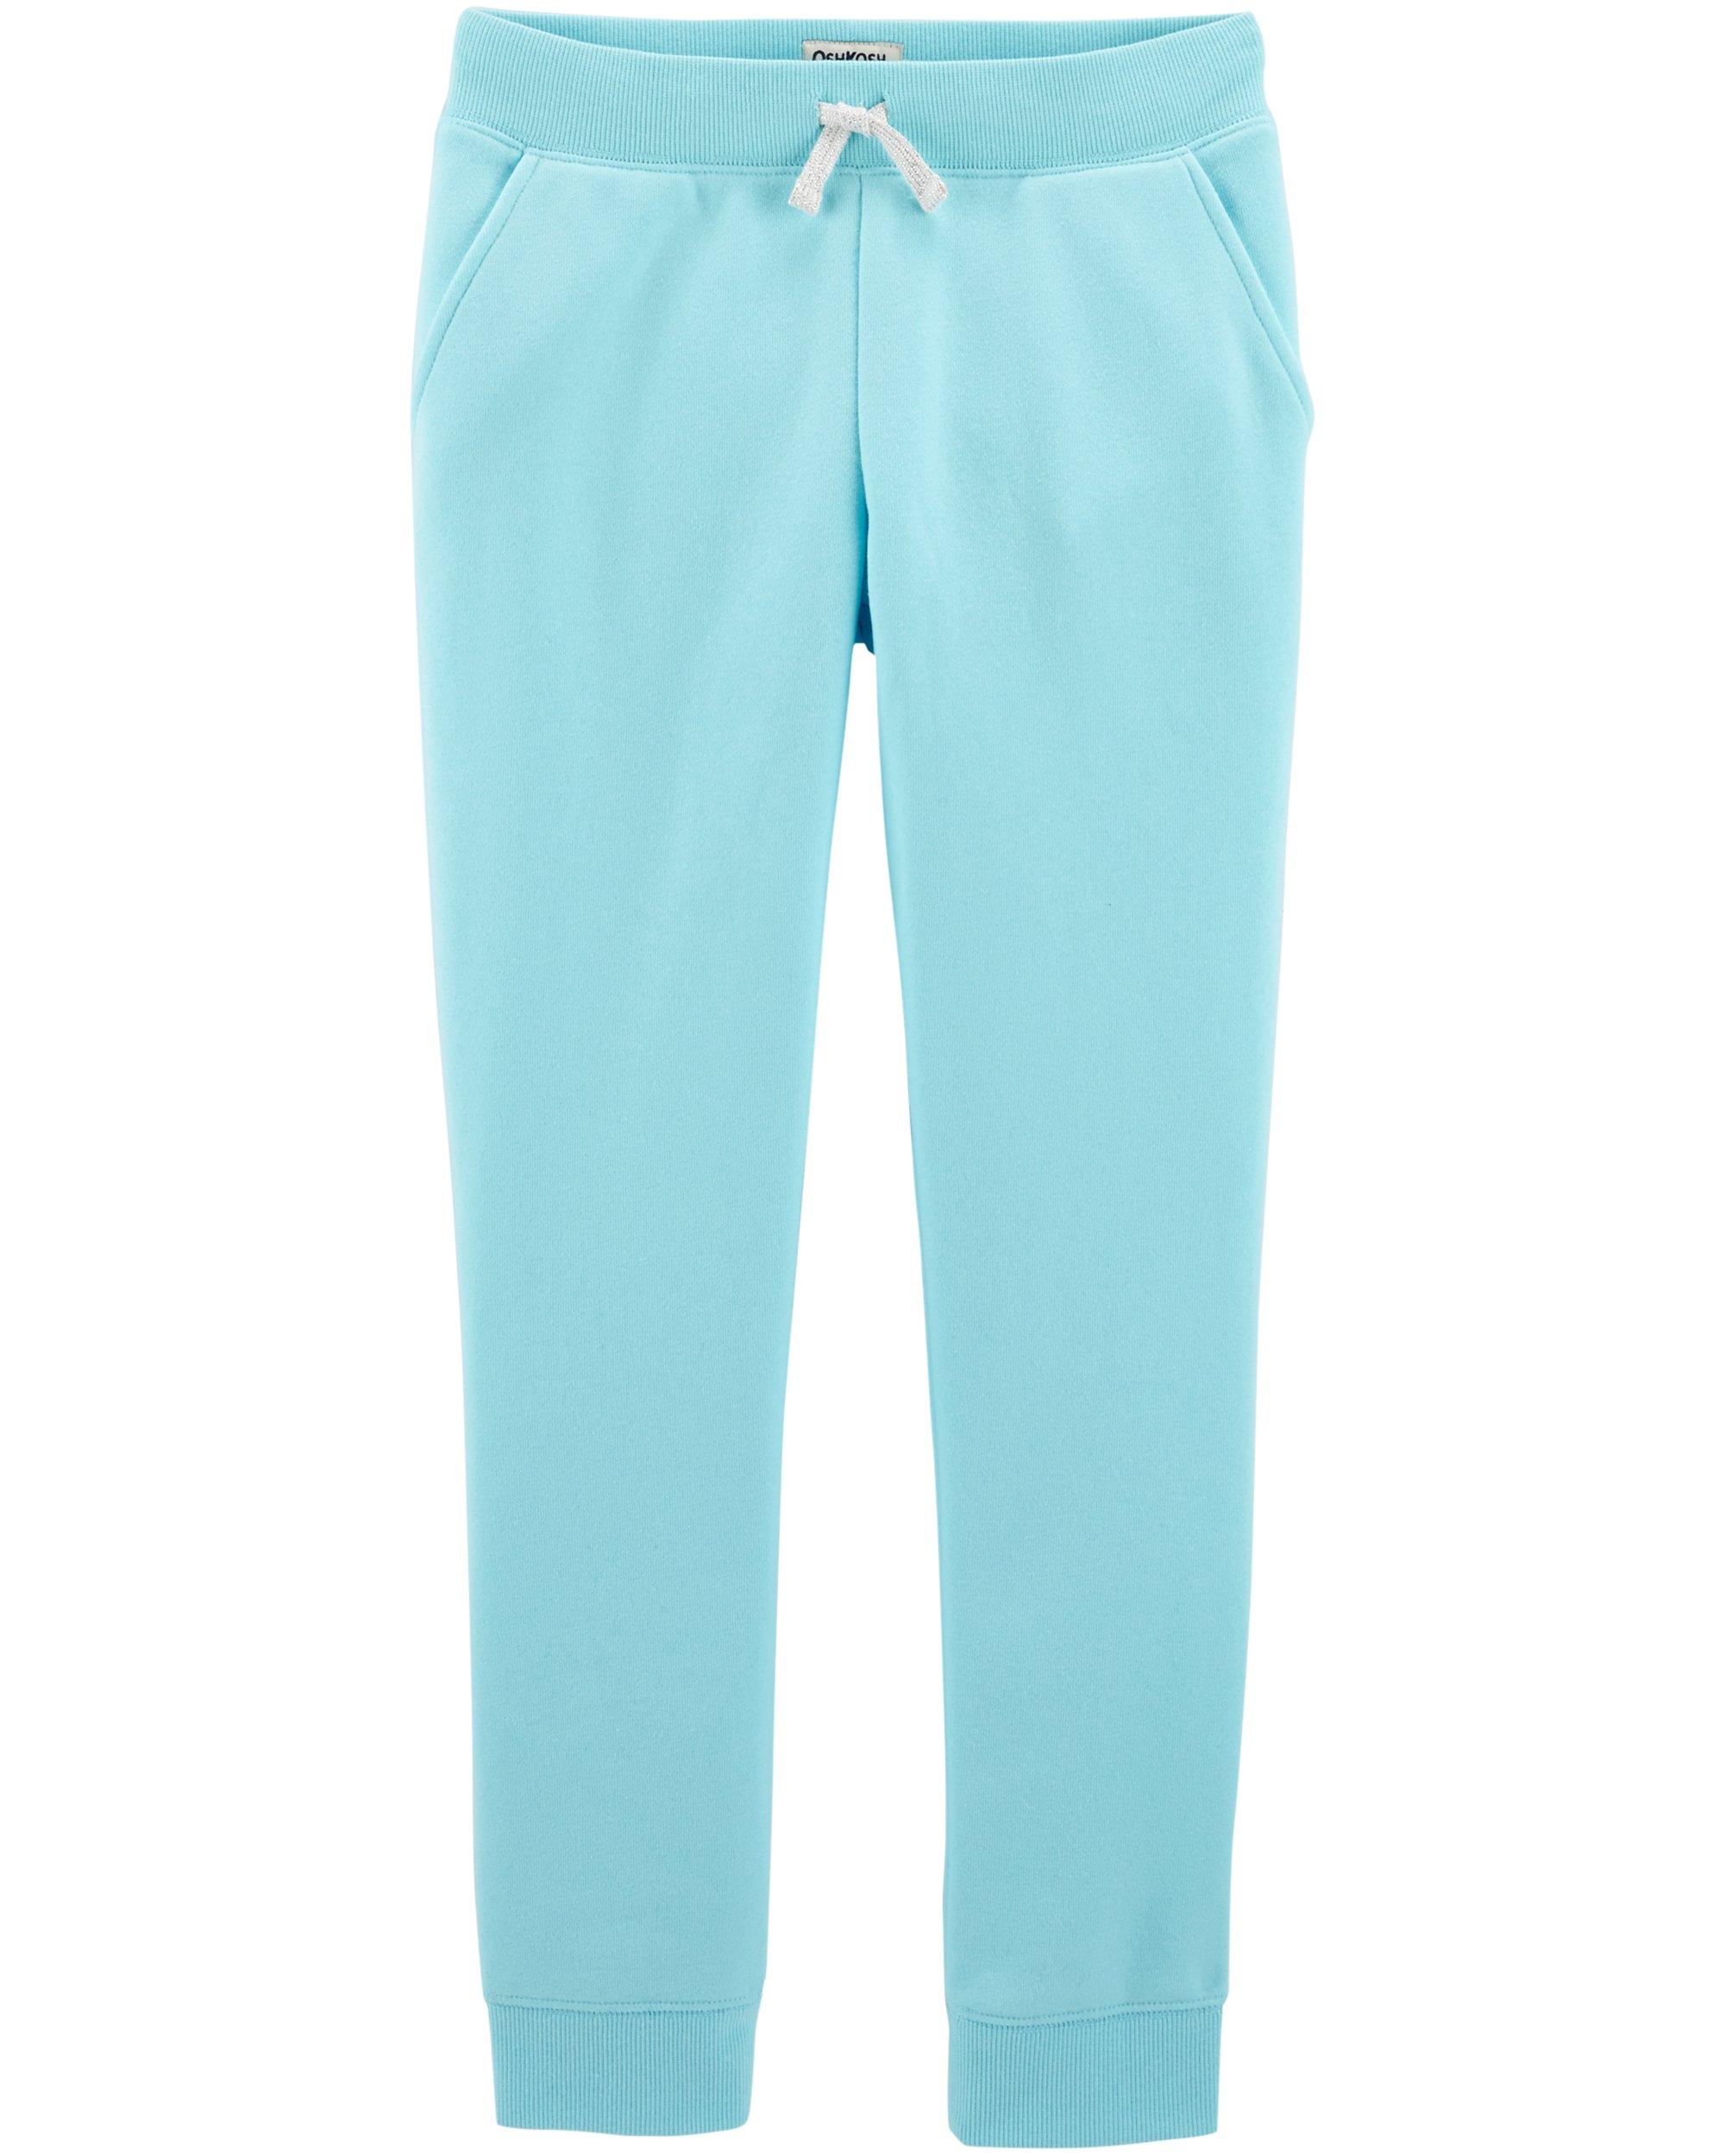 Osh Kosh Girls' Kids Fleece Jogger Pants, Fairy Tale Turquoise, 14